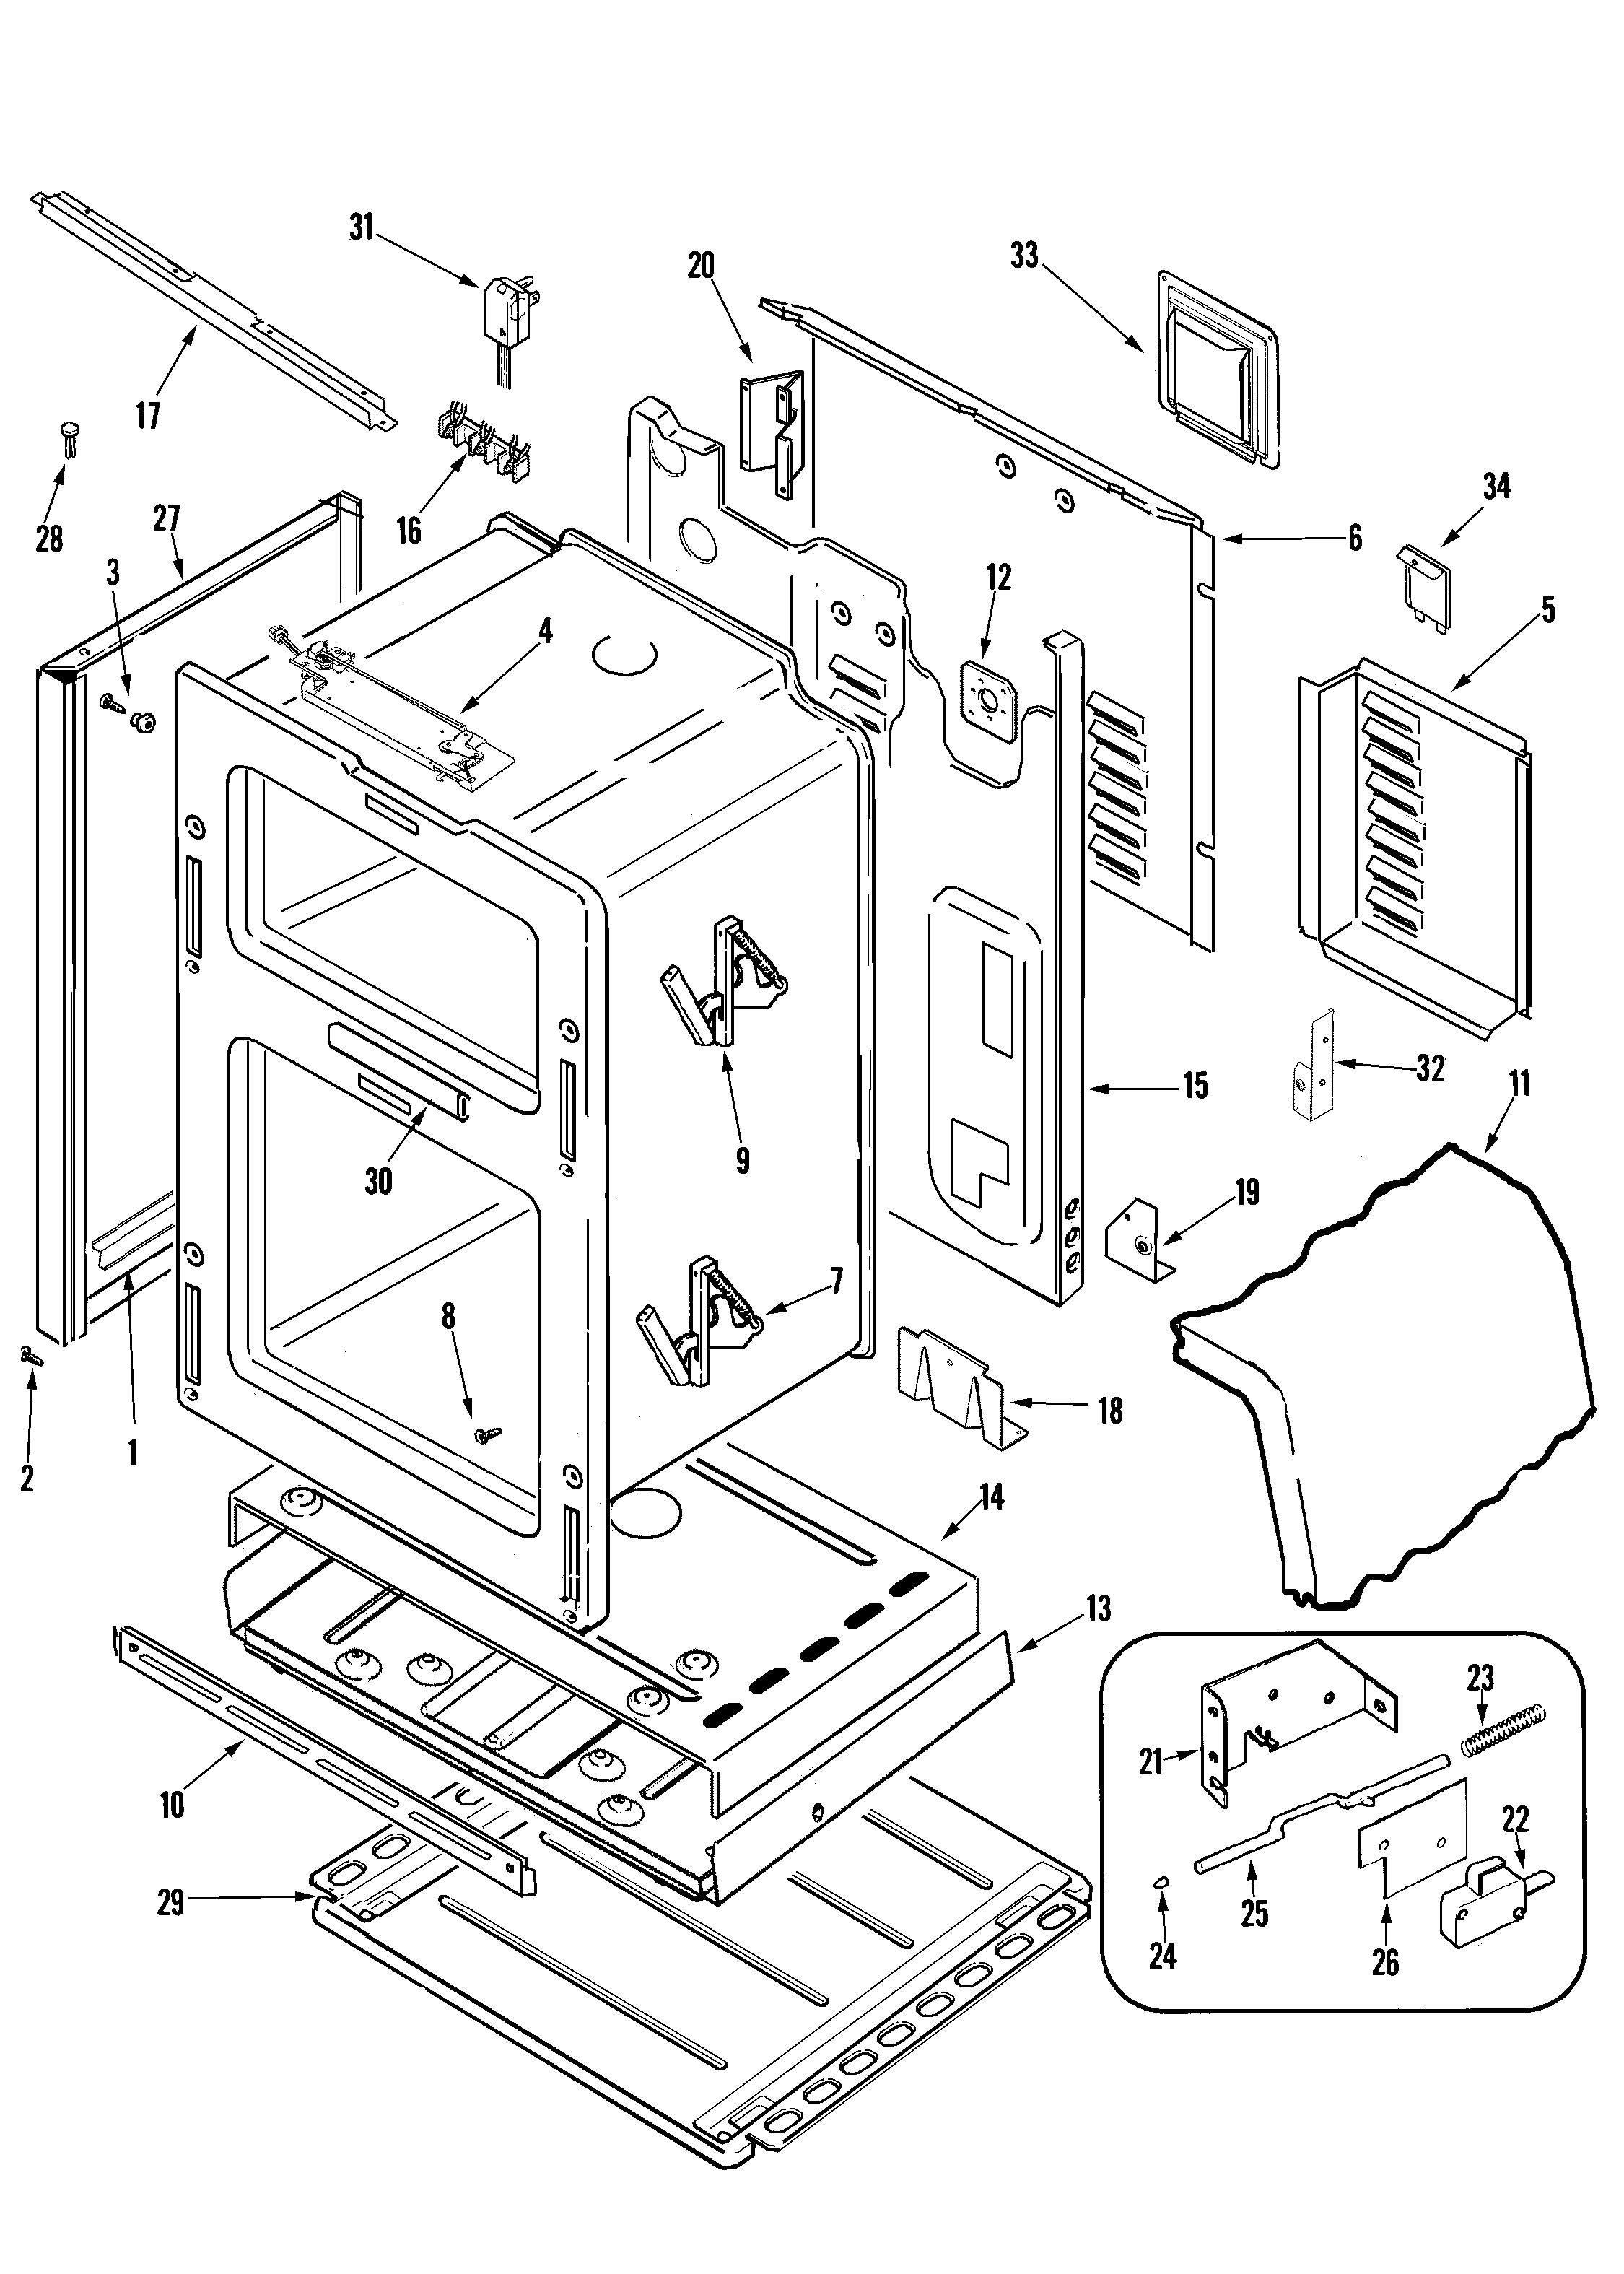 Miraculous Refrigerators Parts Maytag Refrigerator Parts List Wiring Cloud Animomajobocepmohammedshrineorg